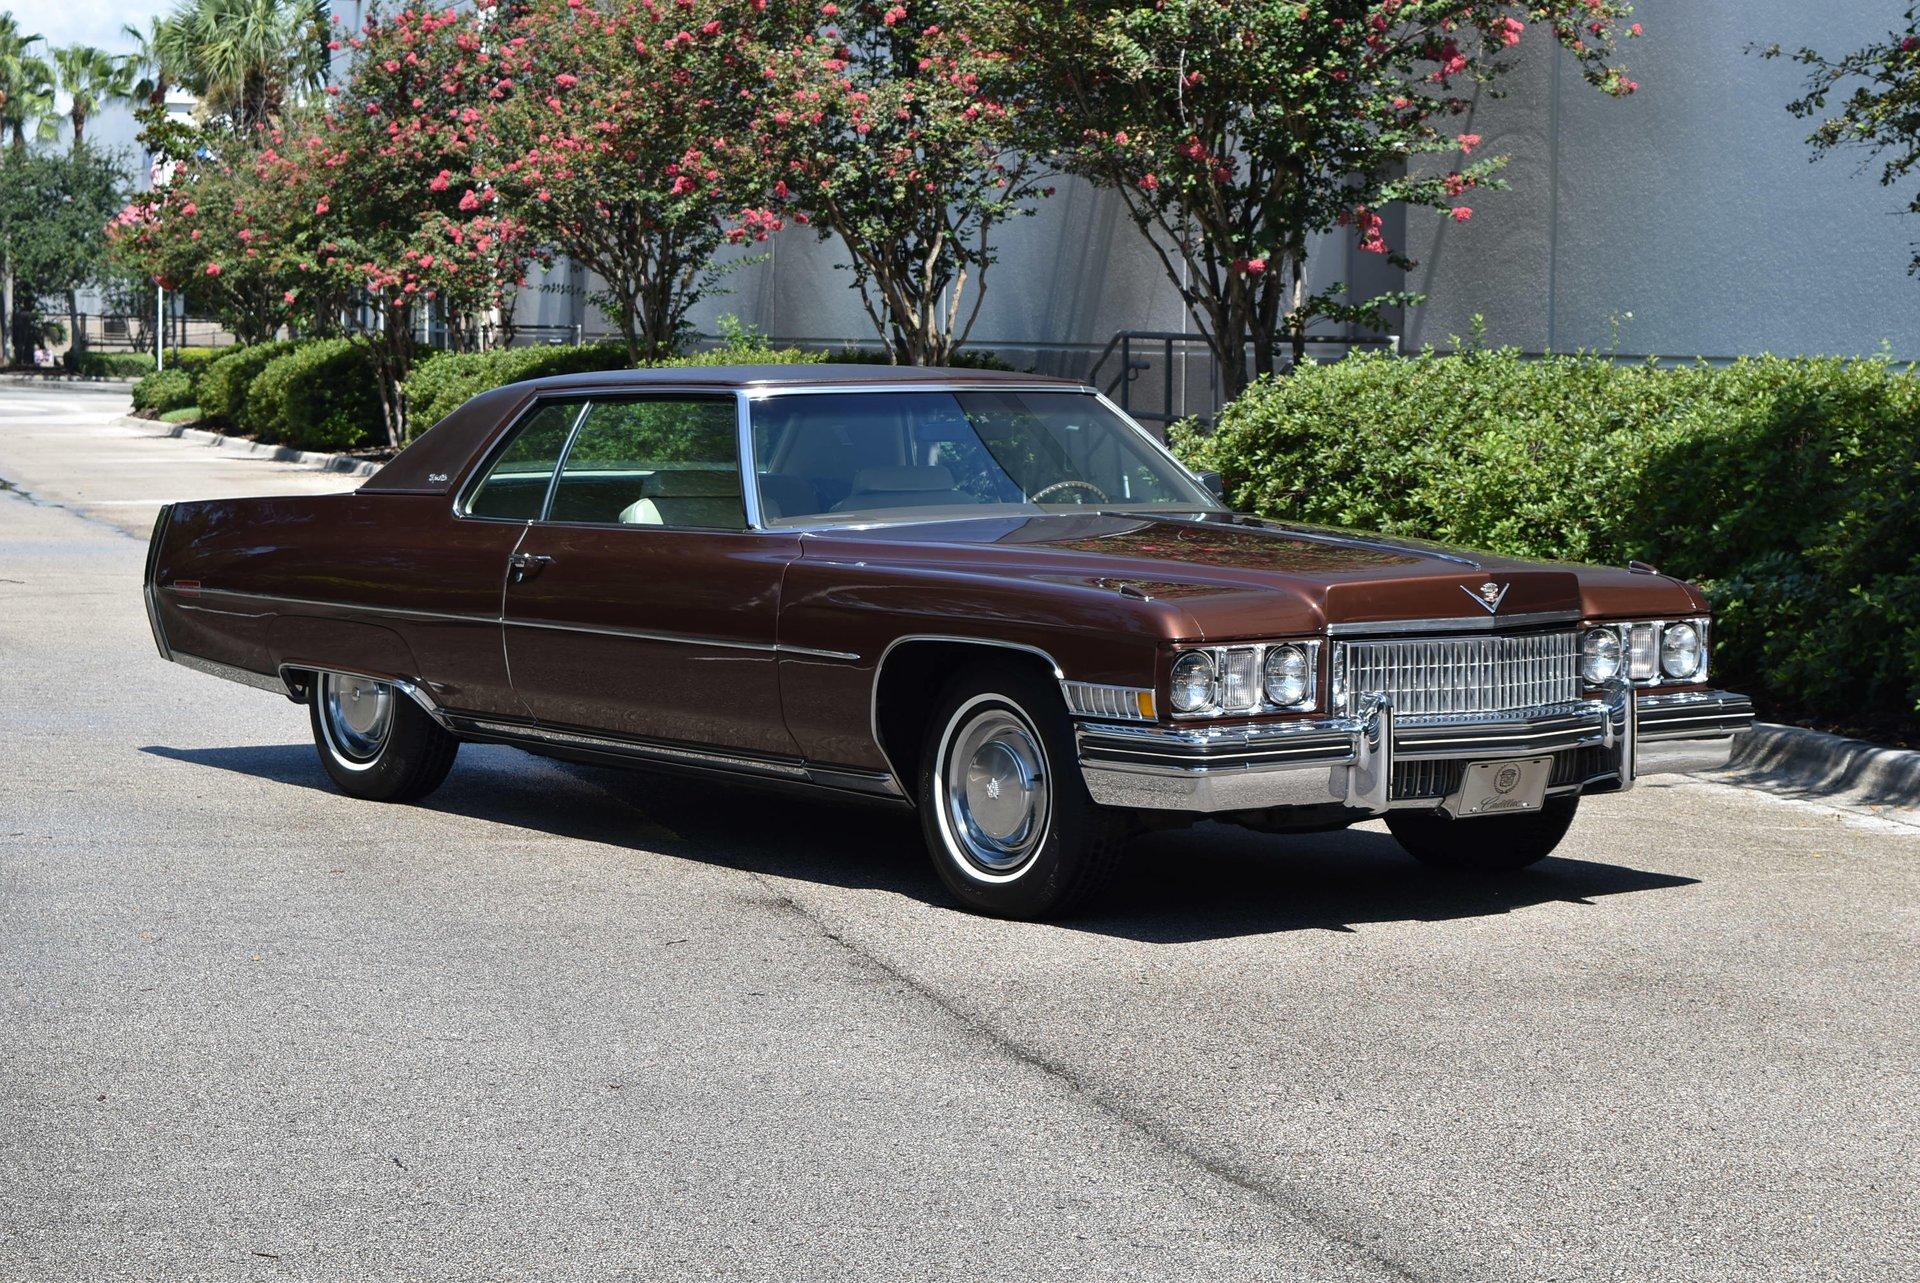 1973 Cadillac Coupe Deville Orlando Classic Cars